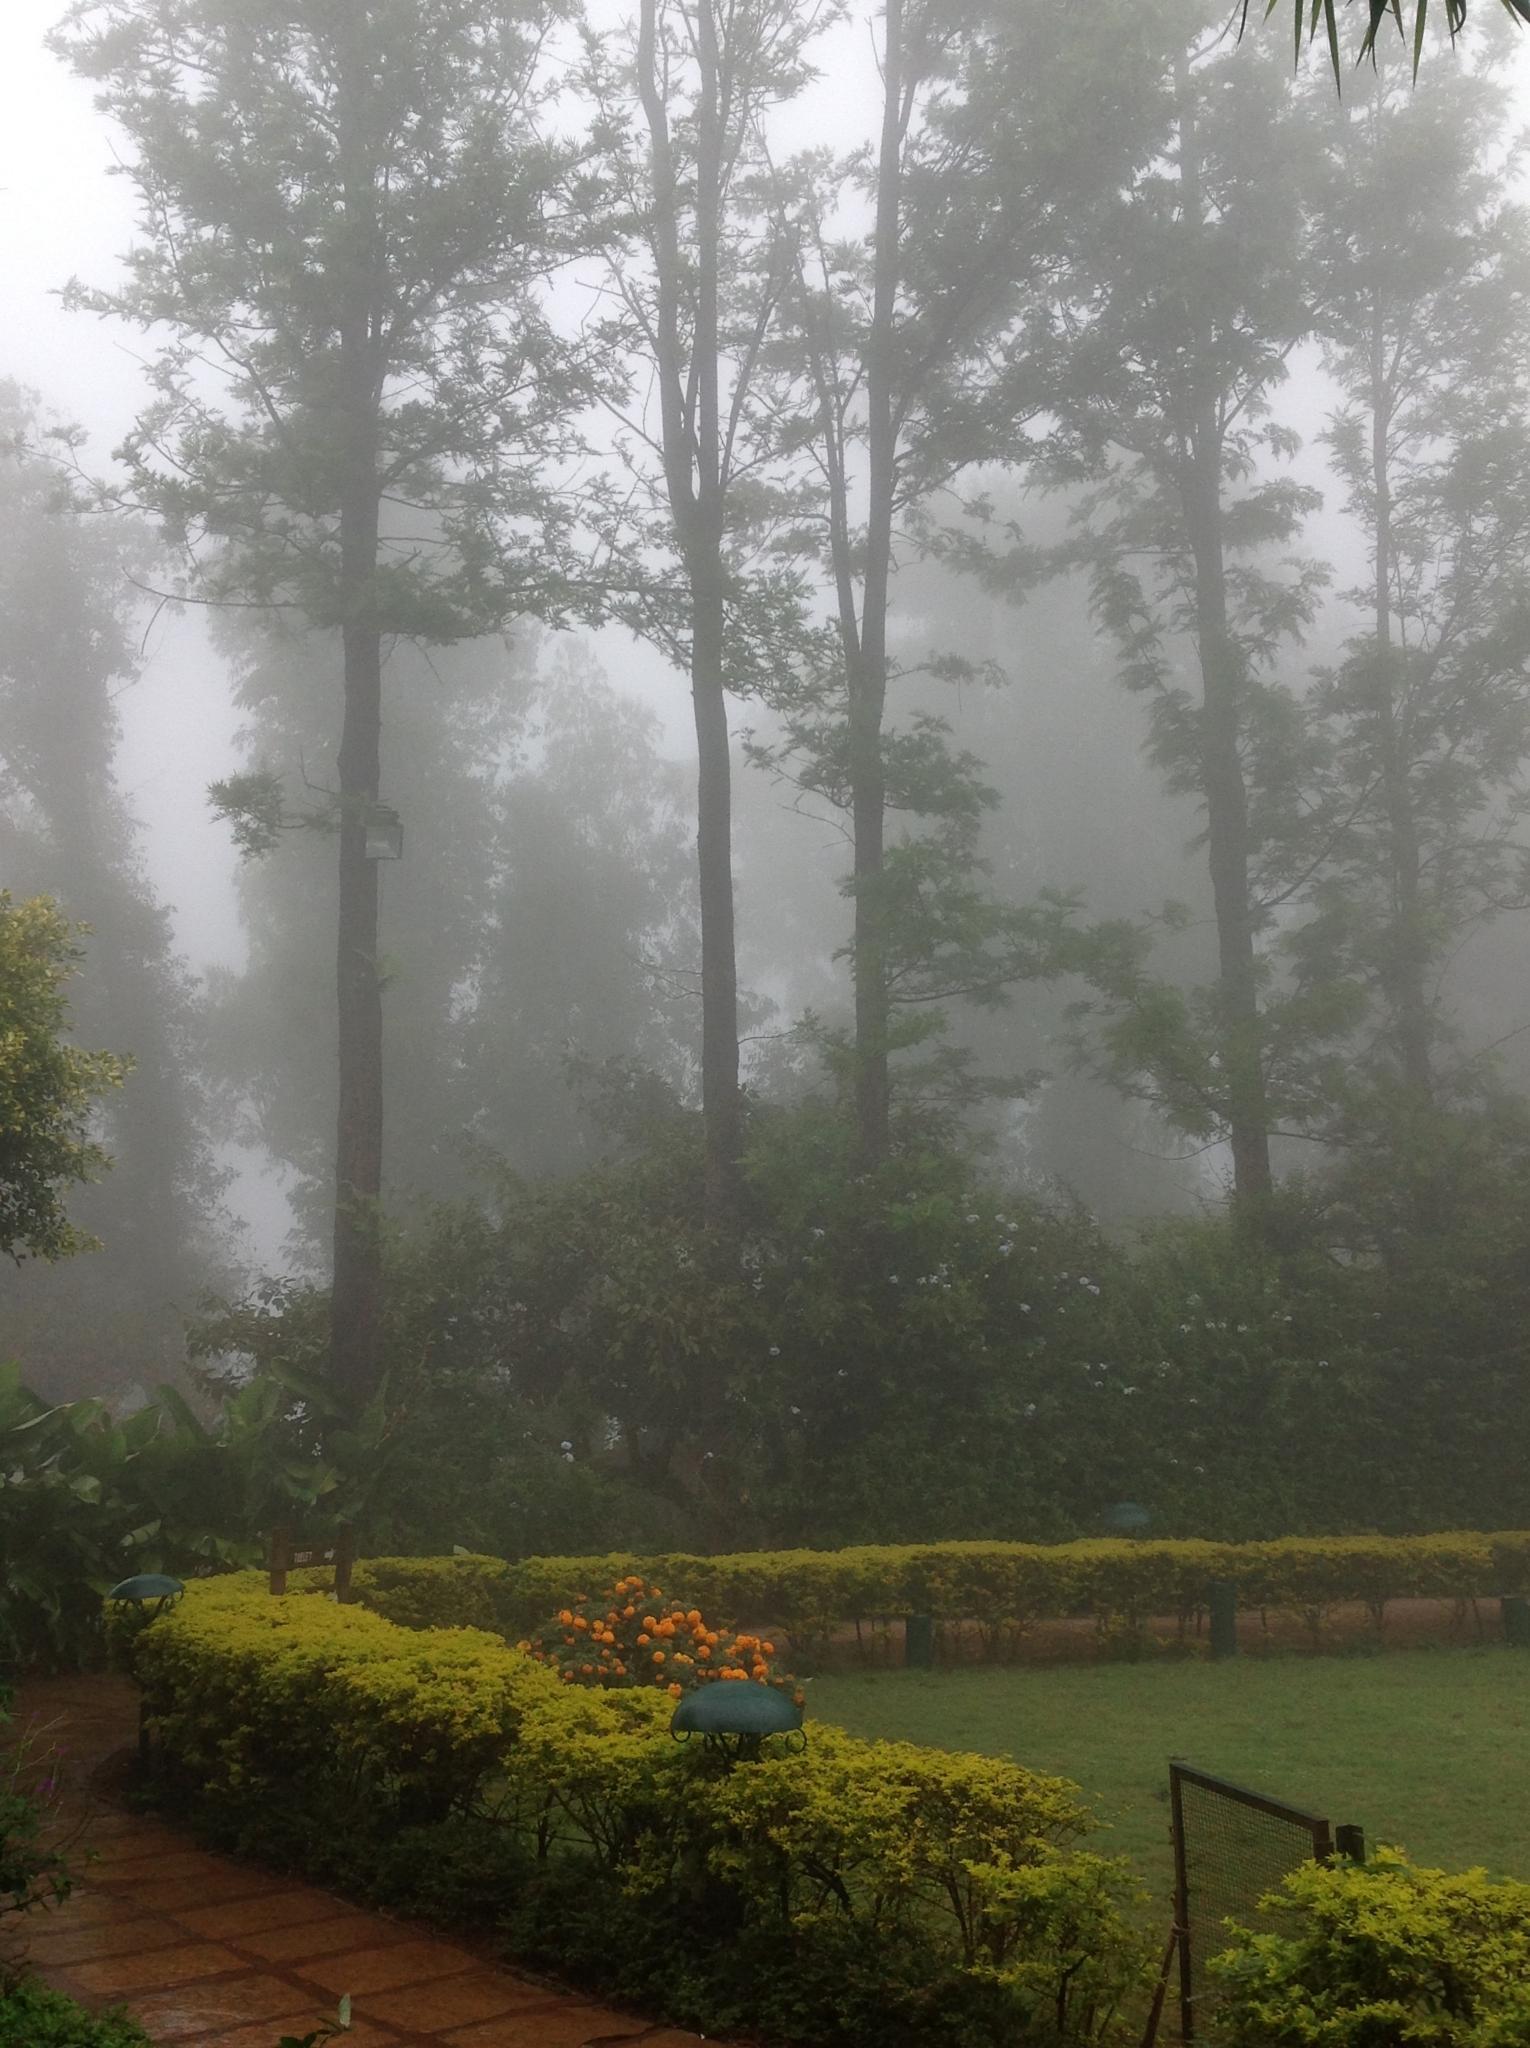 Mist by Sridhar R Setty